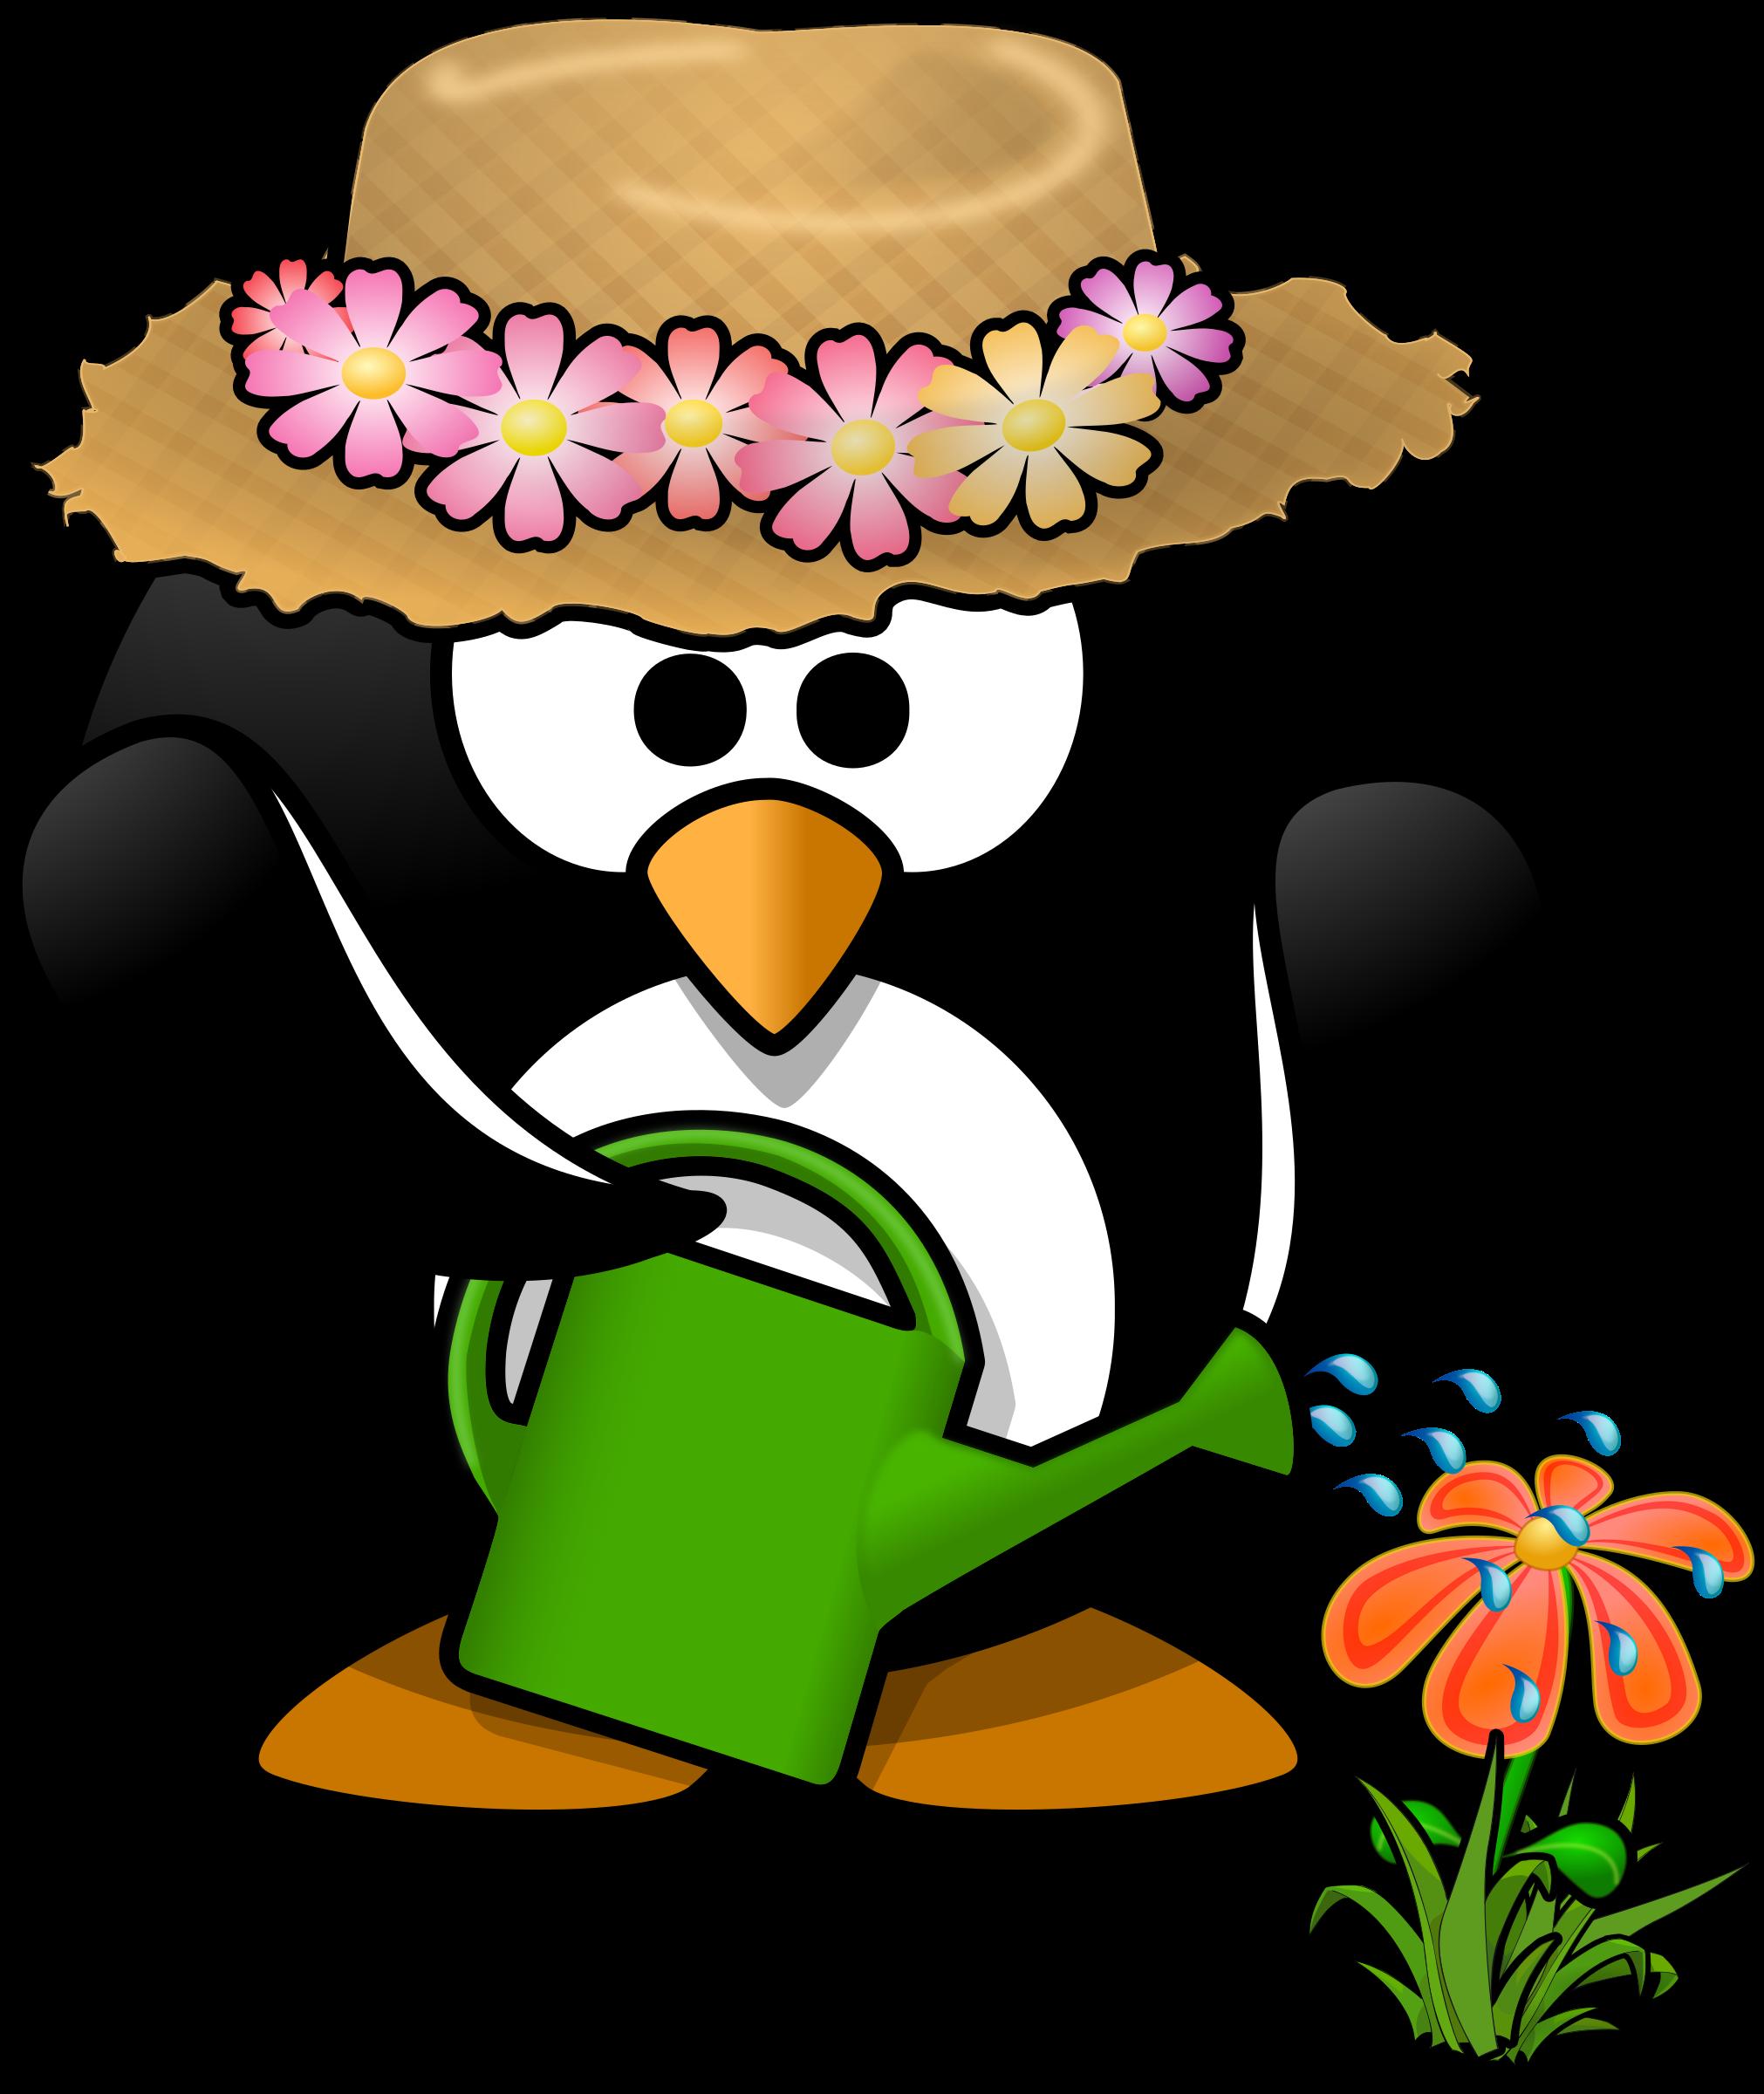 Penguin clipart spring Working garden Microsoft a Zone